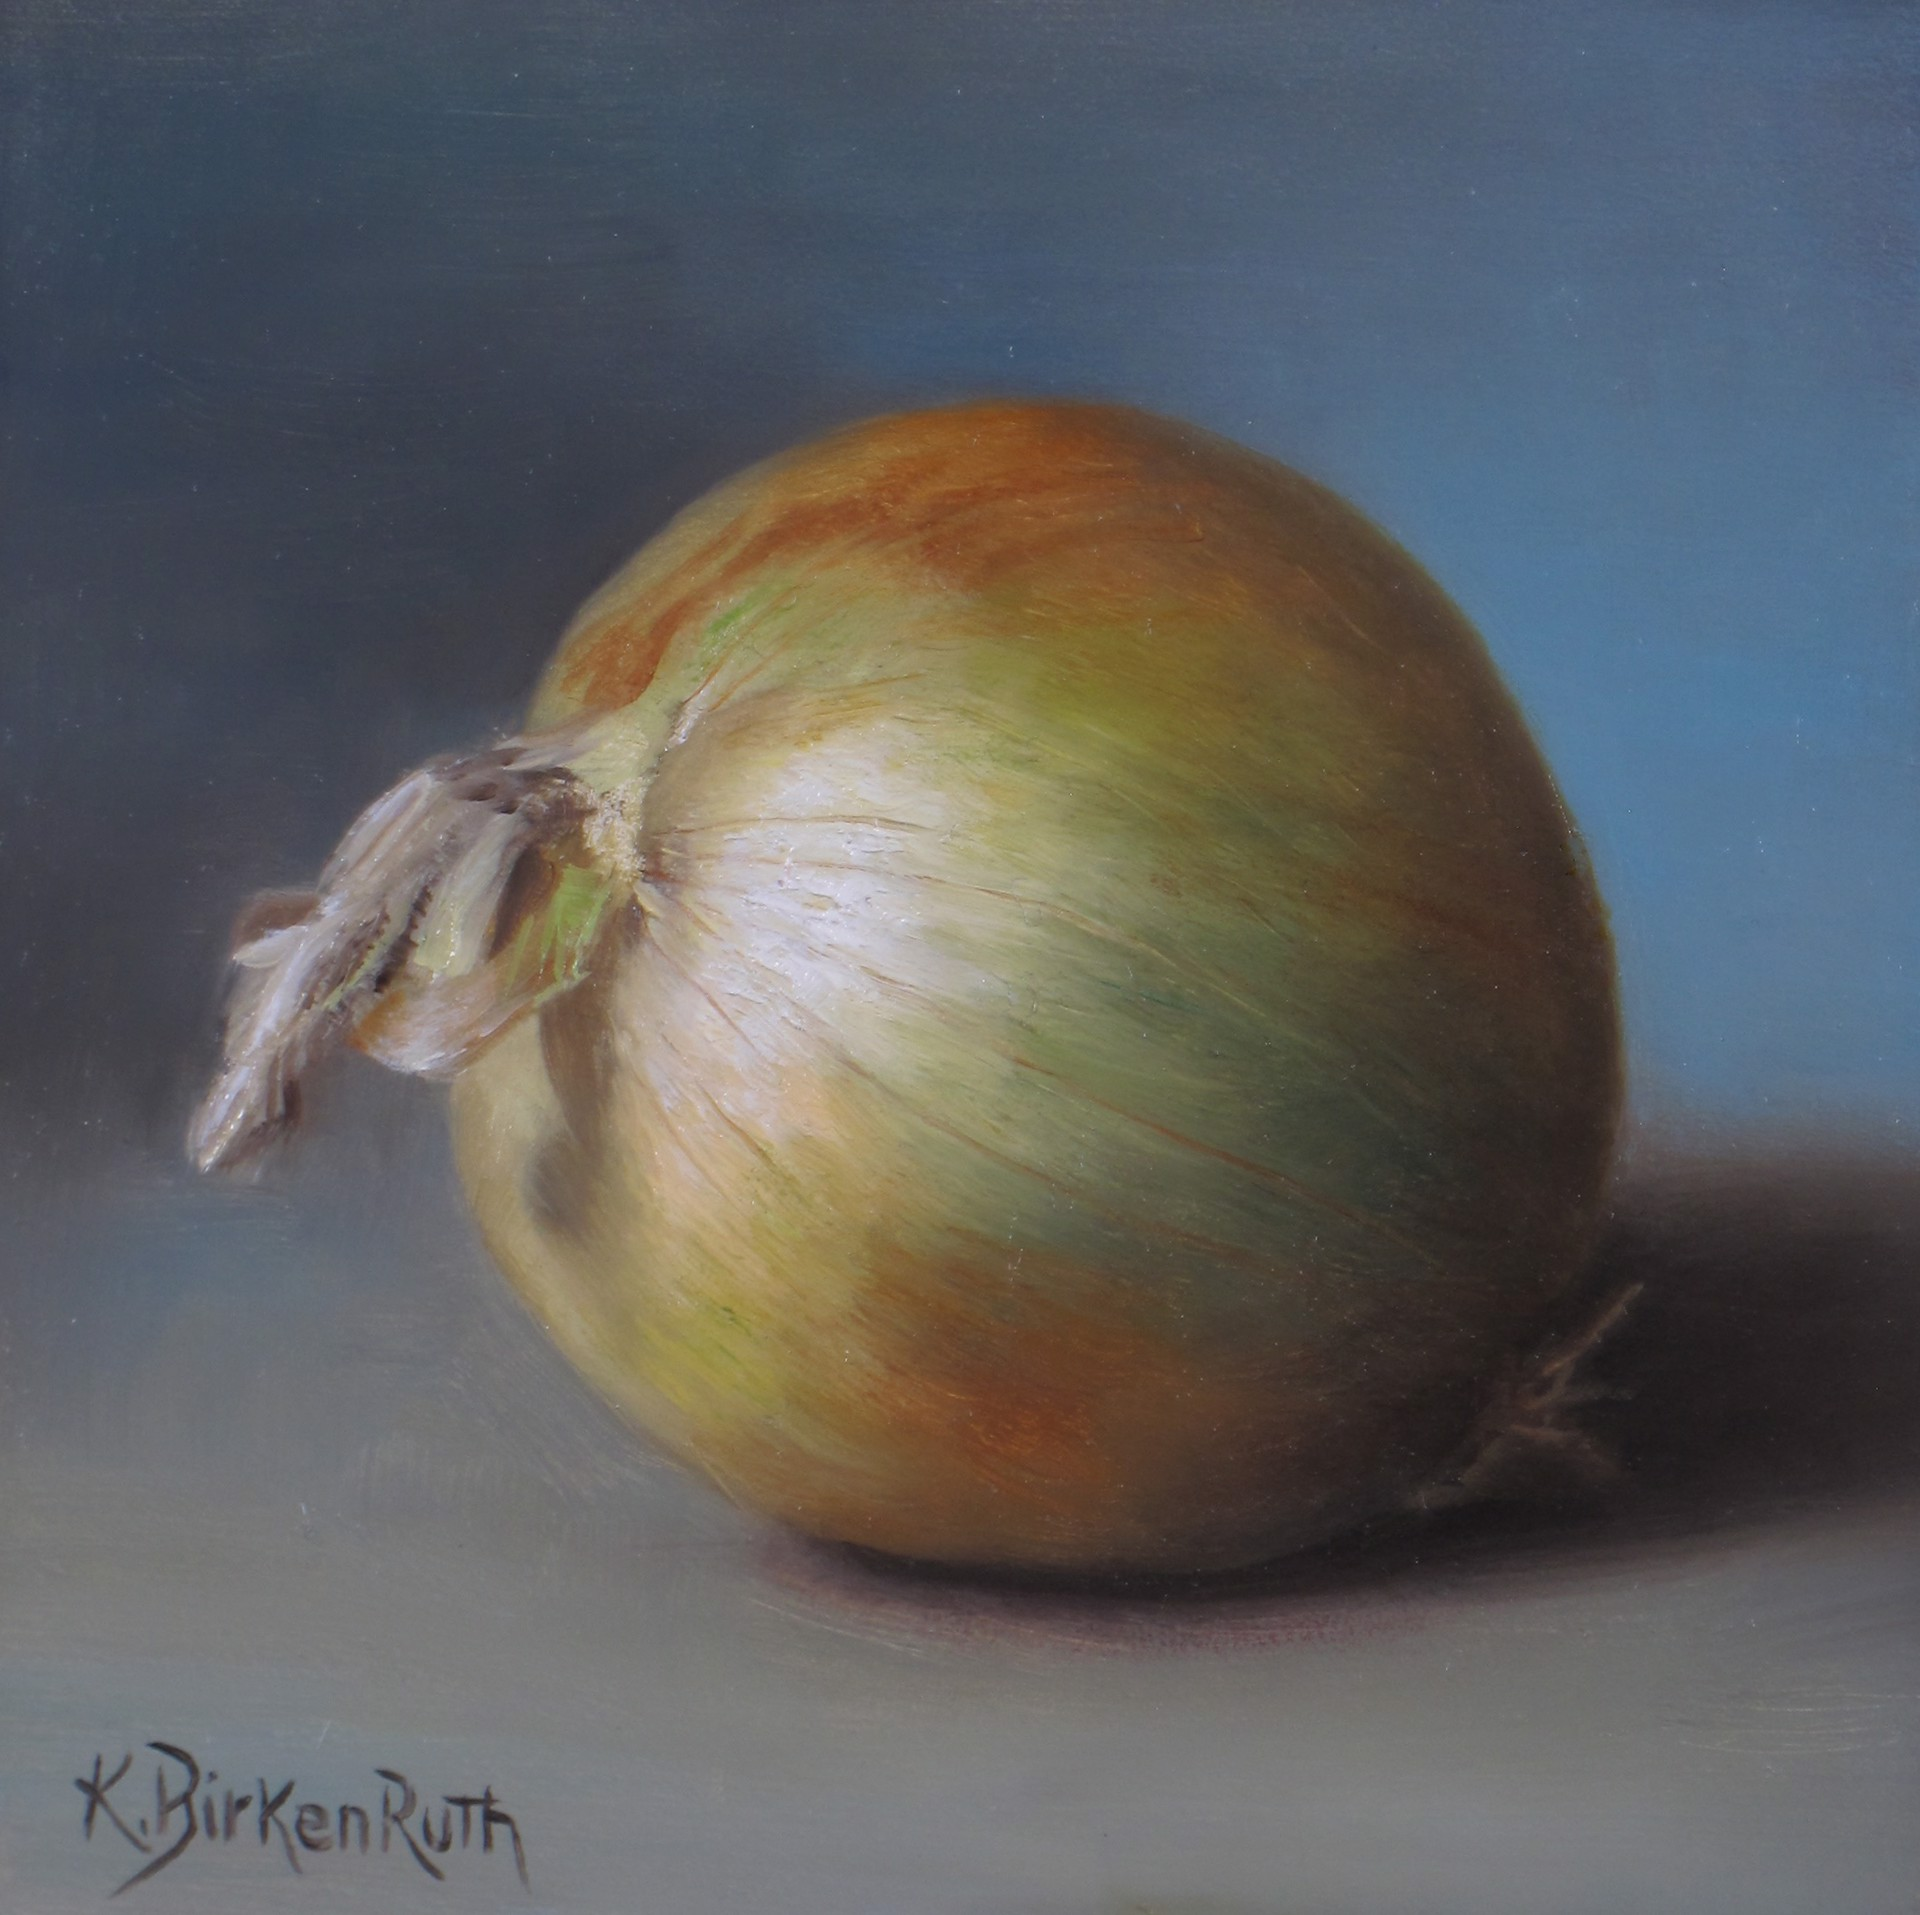 Yellow Onion by Kelly Birkenruth